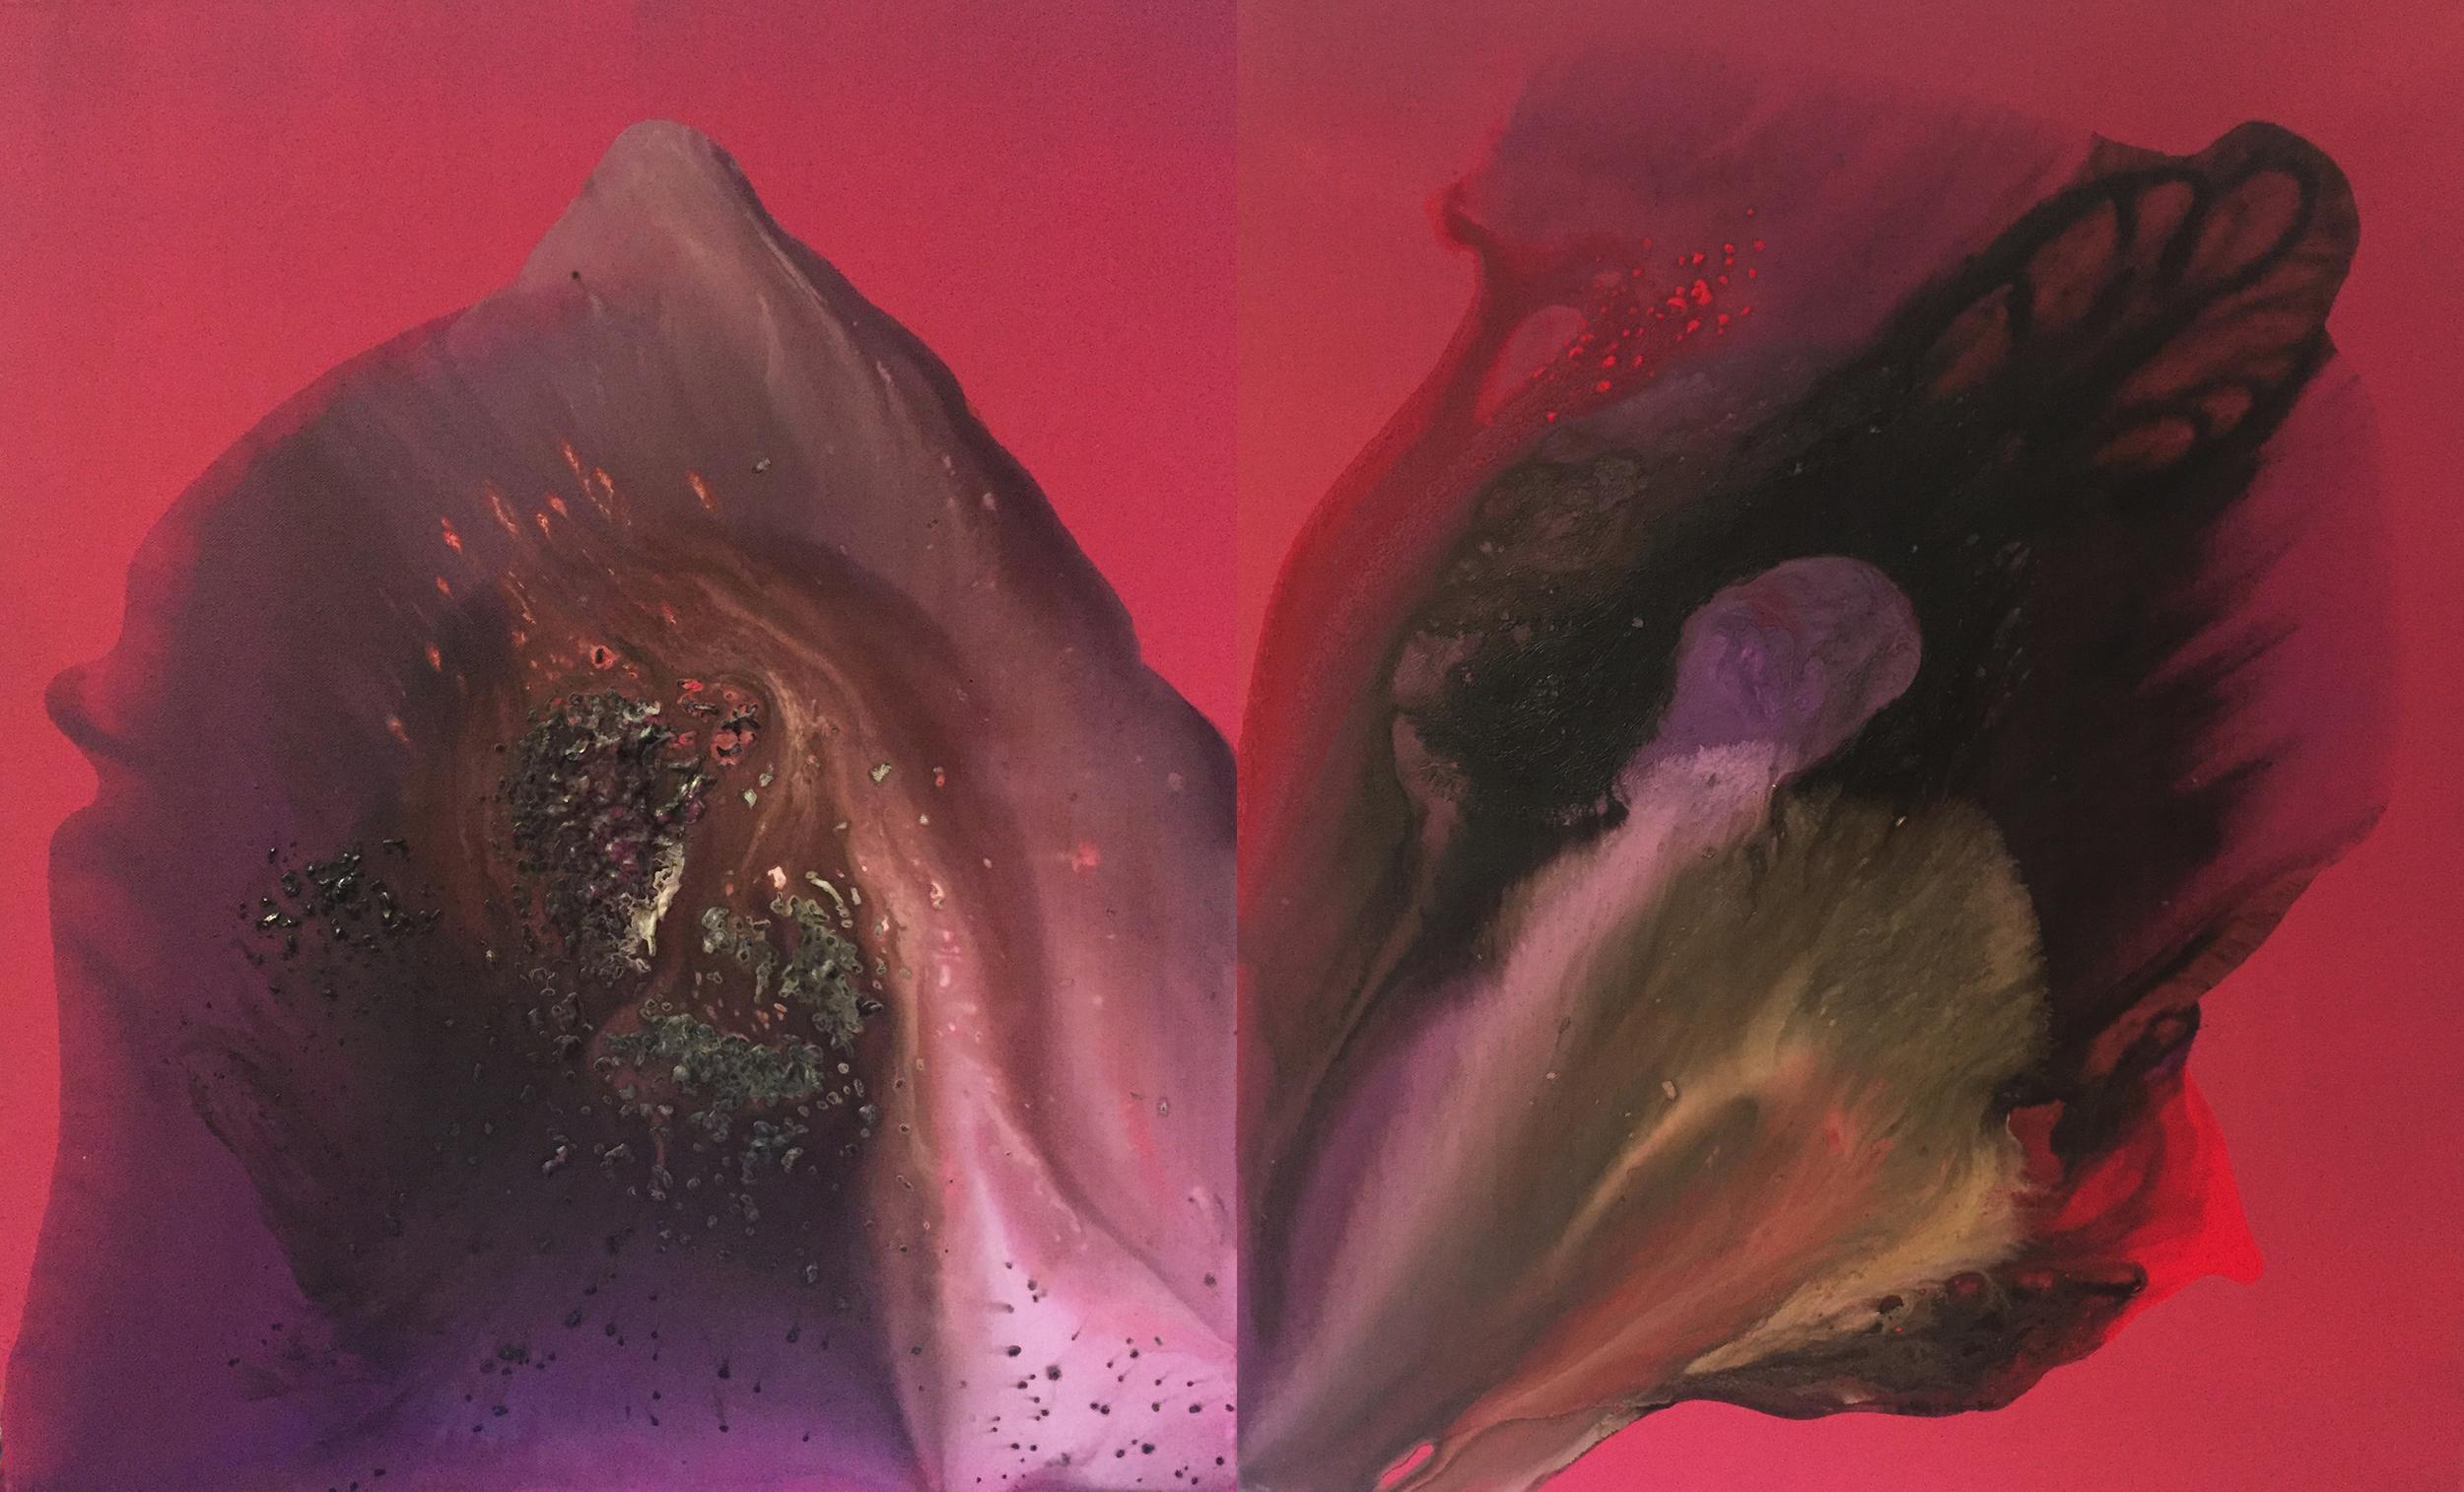 figure_13  acrylic and pumice  gel on canvas  122 cm X 73 cm  2015